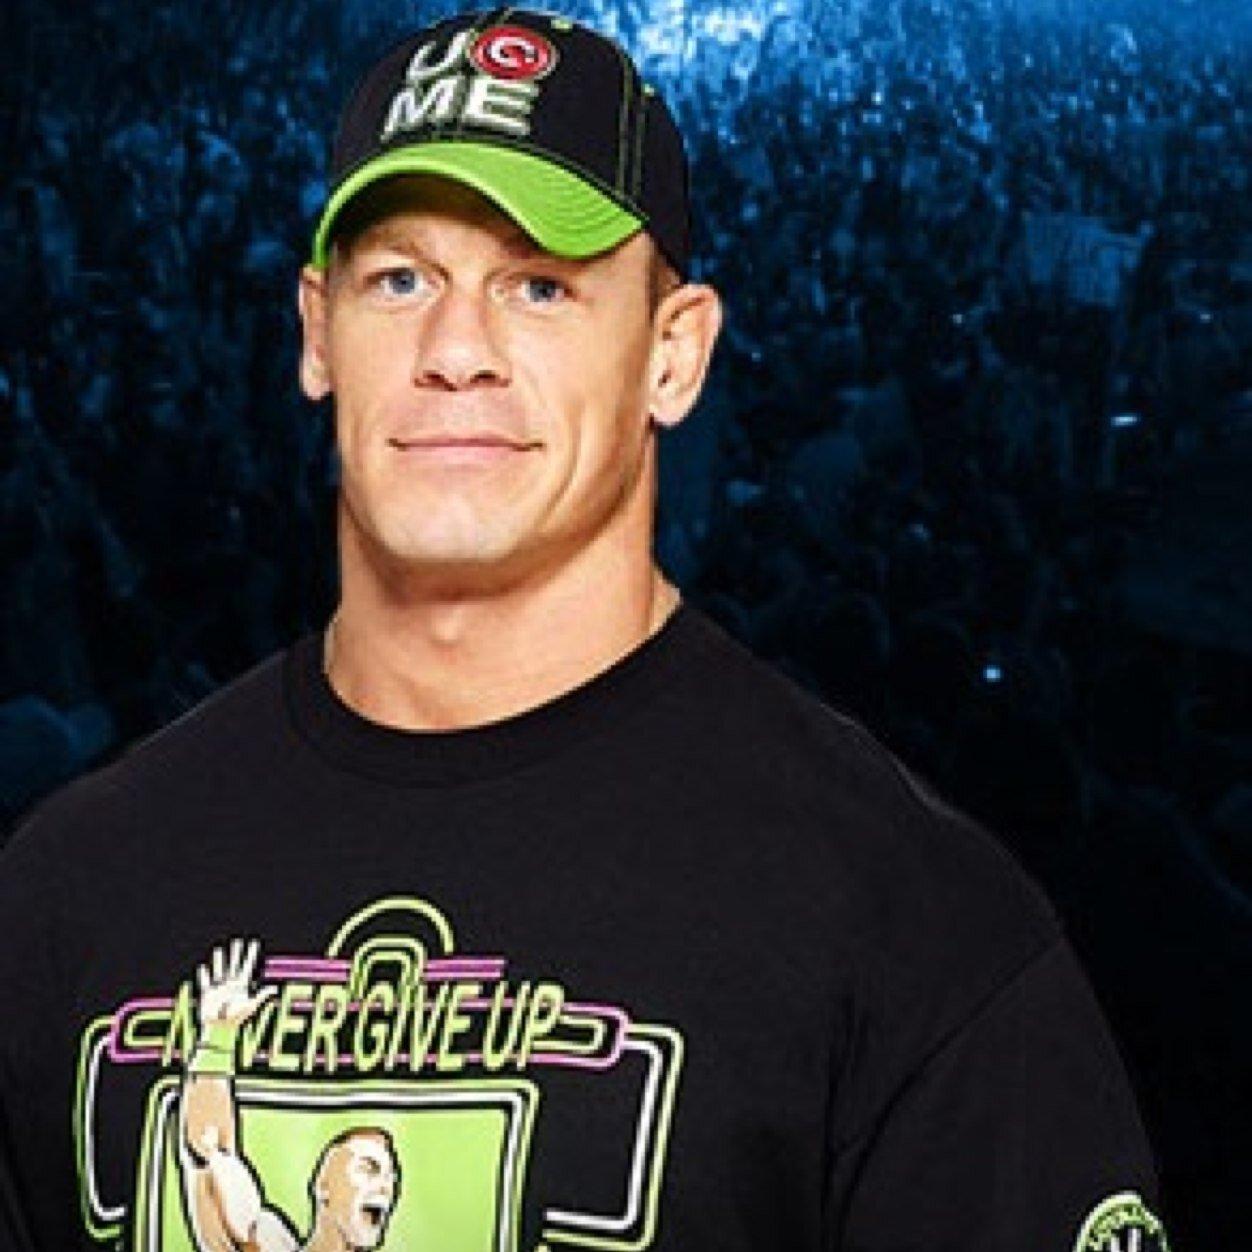 John Cena Neon Never Give Up John Cena John Cena Pictures Wwe Superstar John Cena